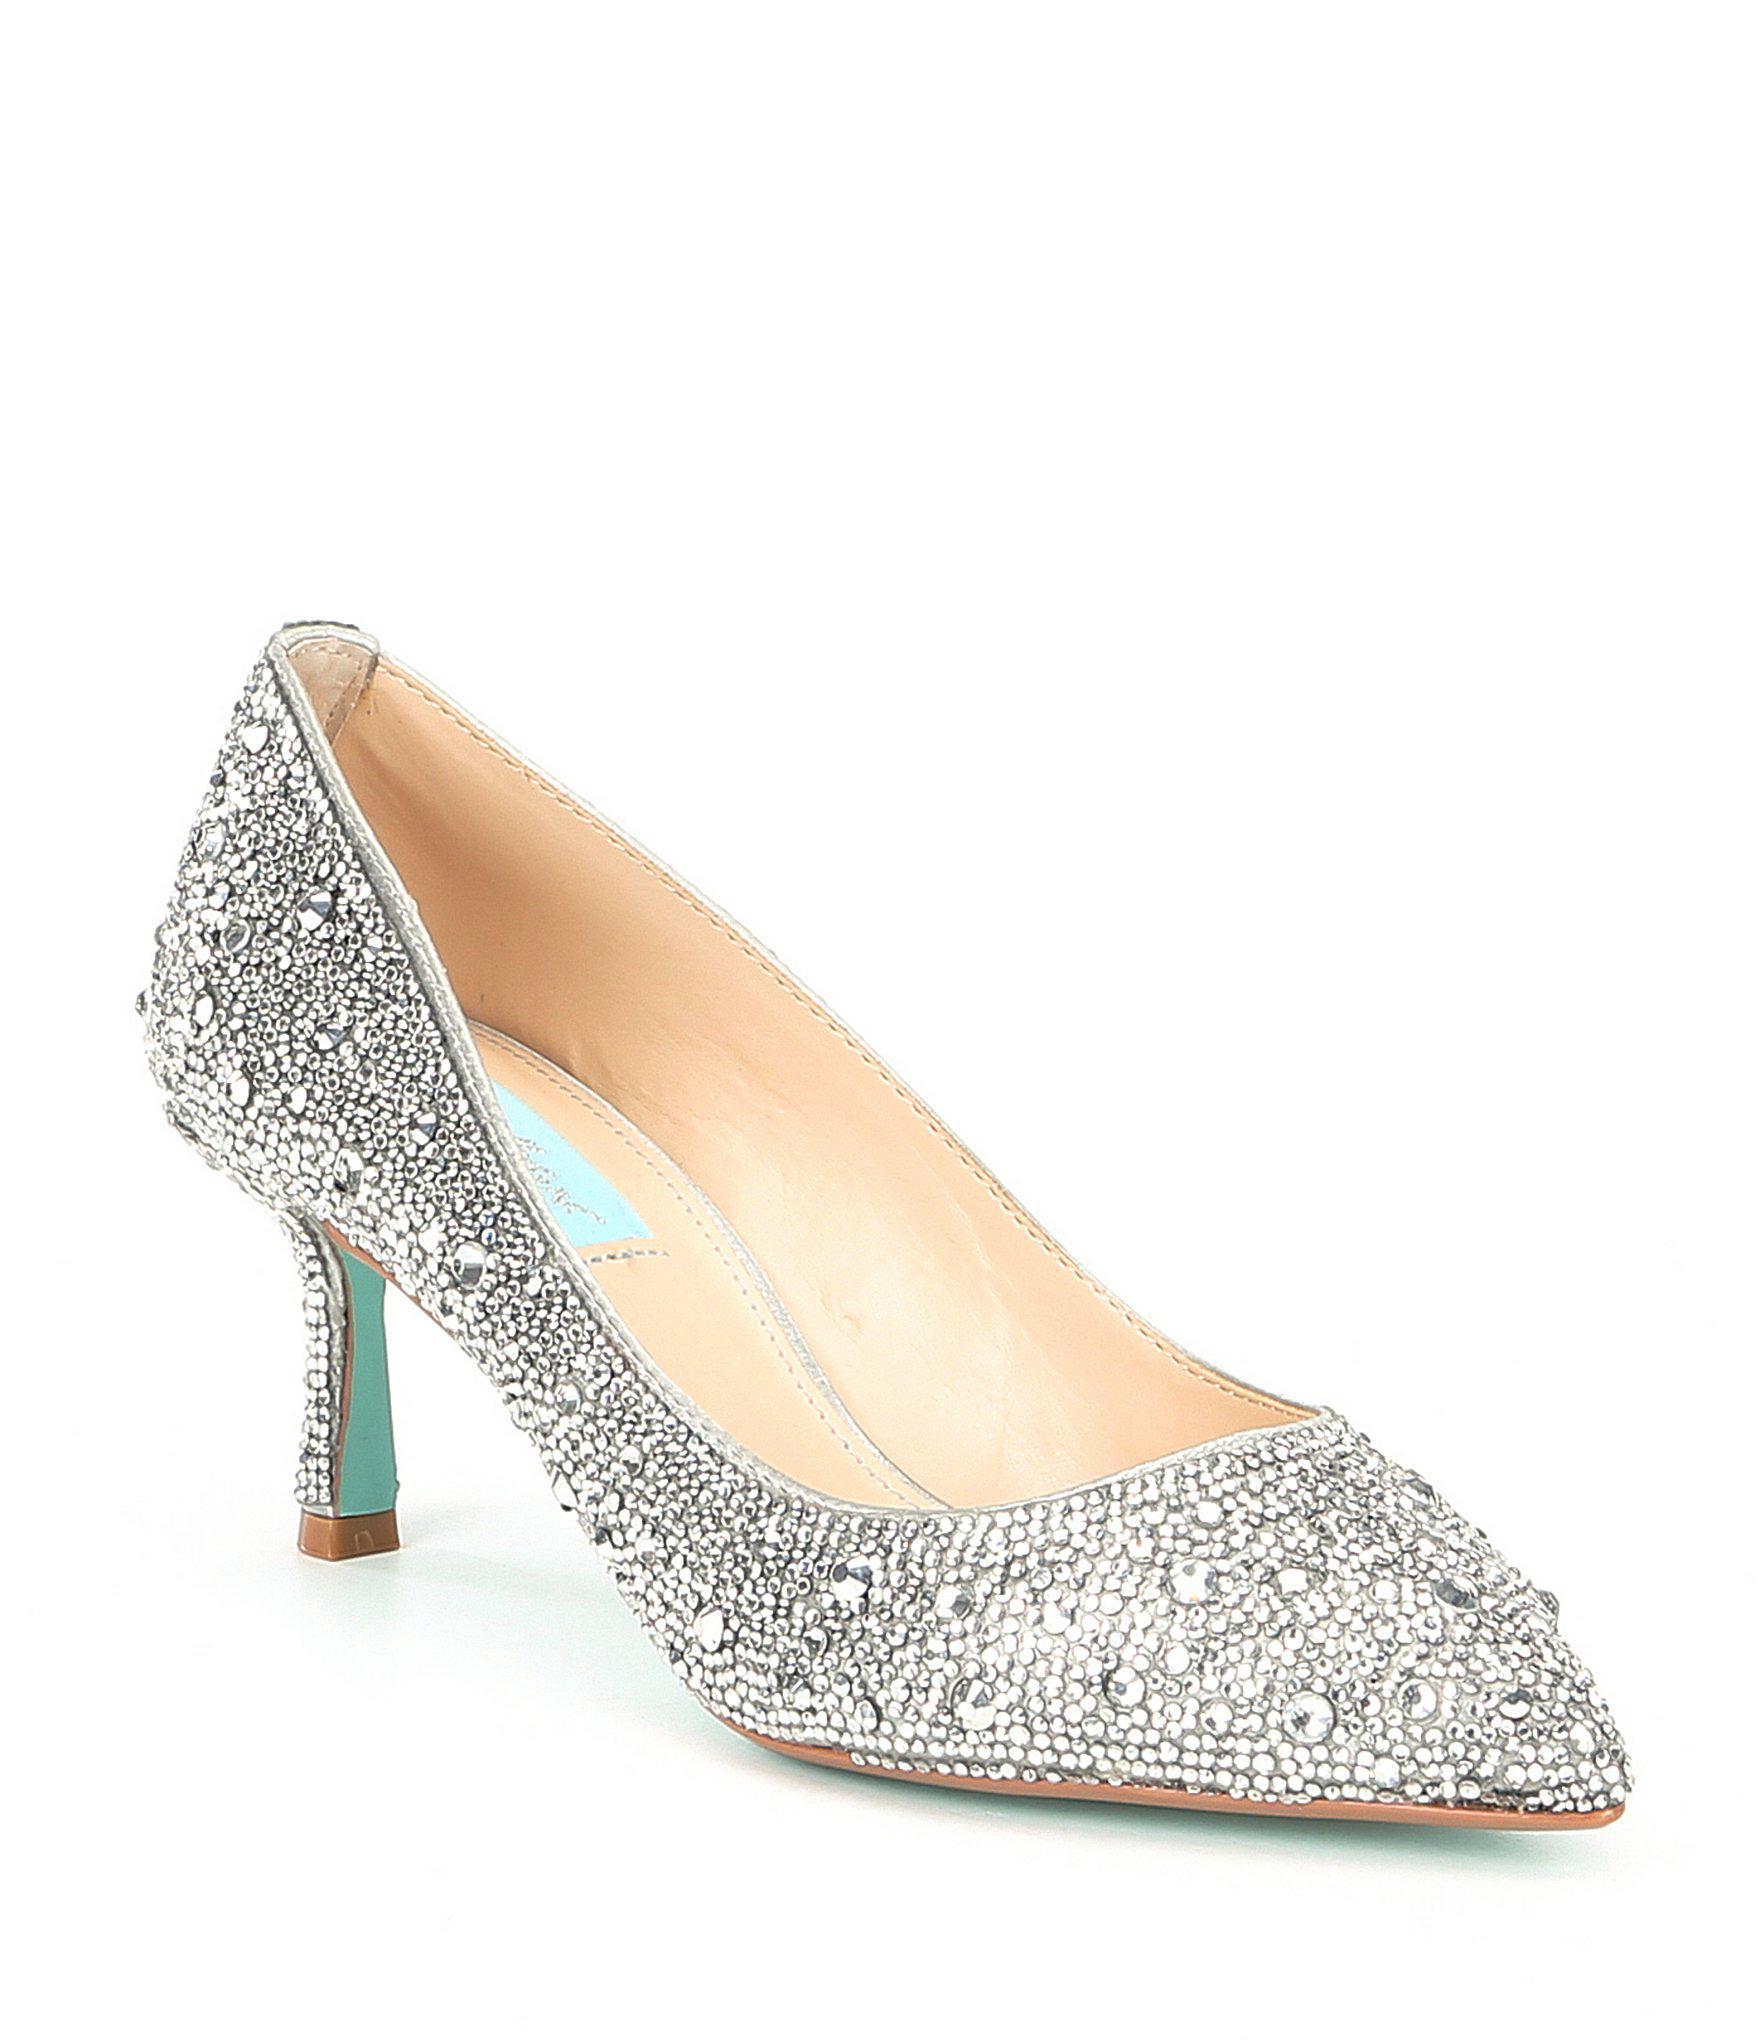 5f209c02e33 Lyst - Betsey Johnson Blue By Jora Glitter Jeweled Kitten Heel Pumps ...